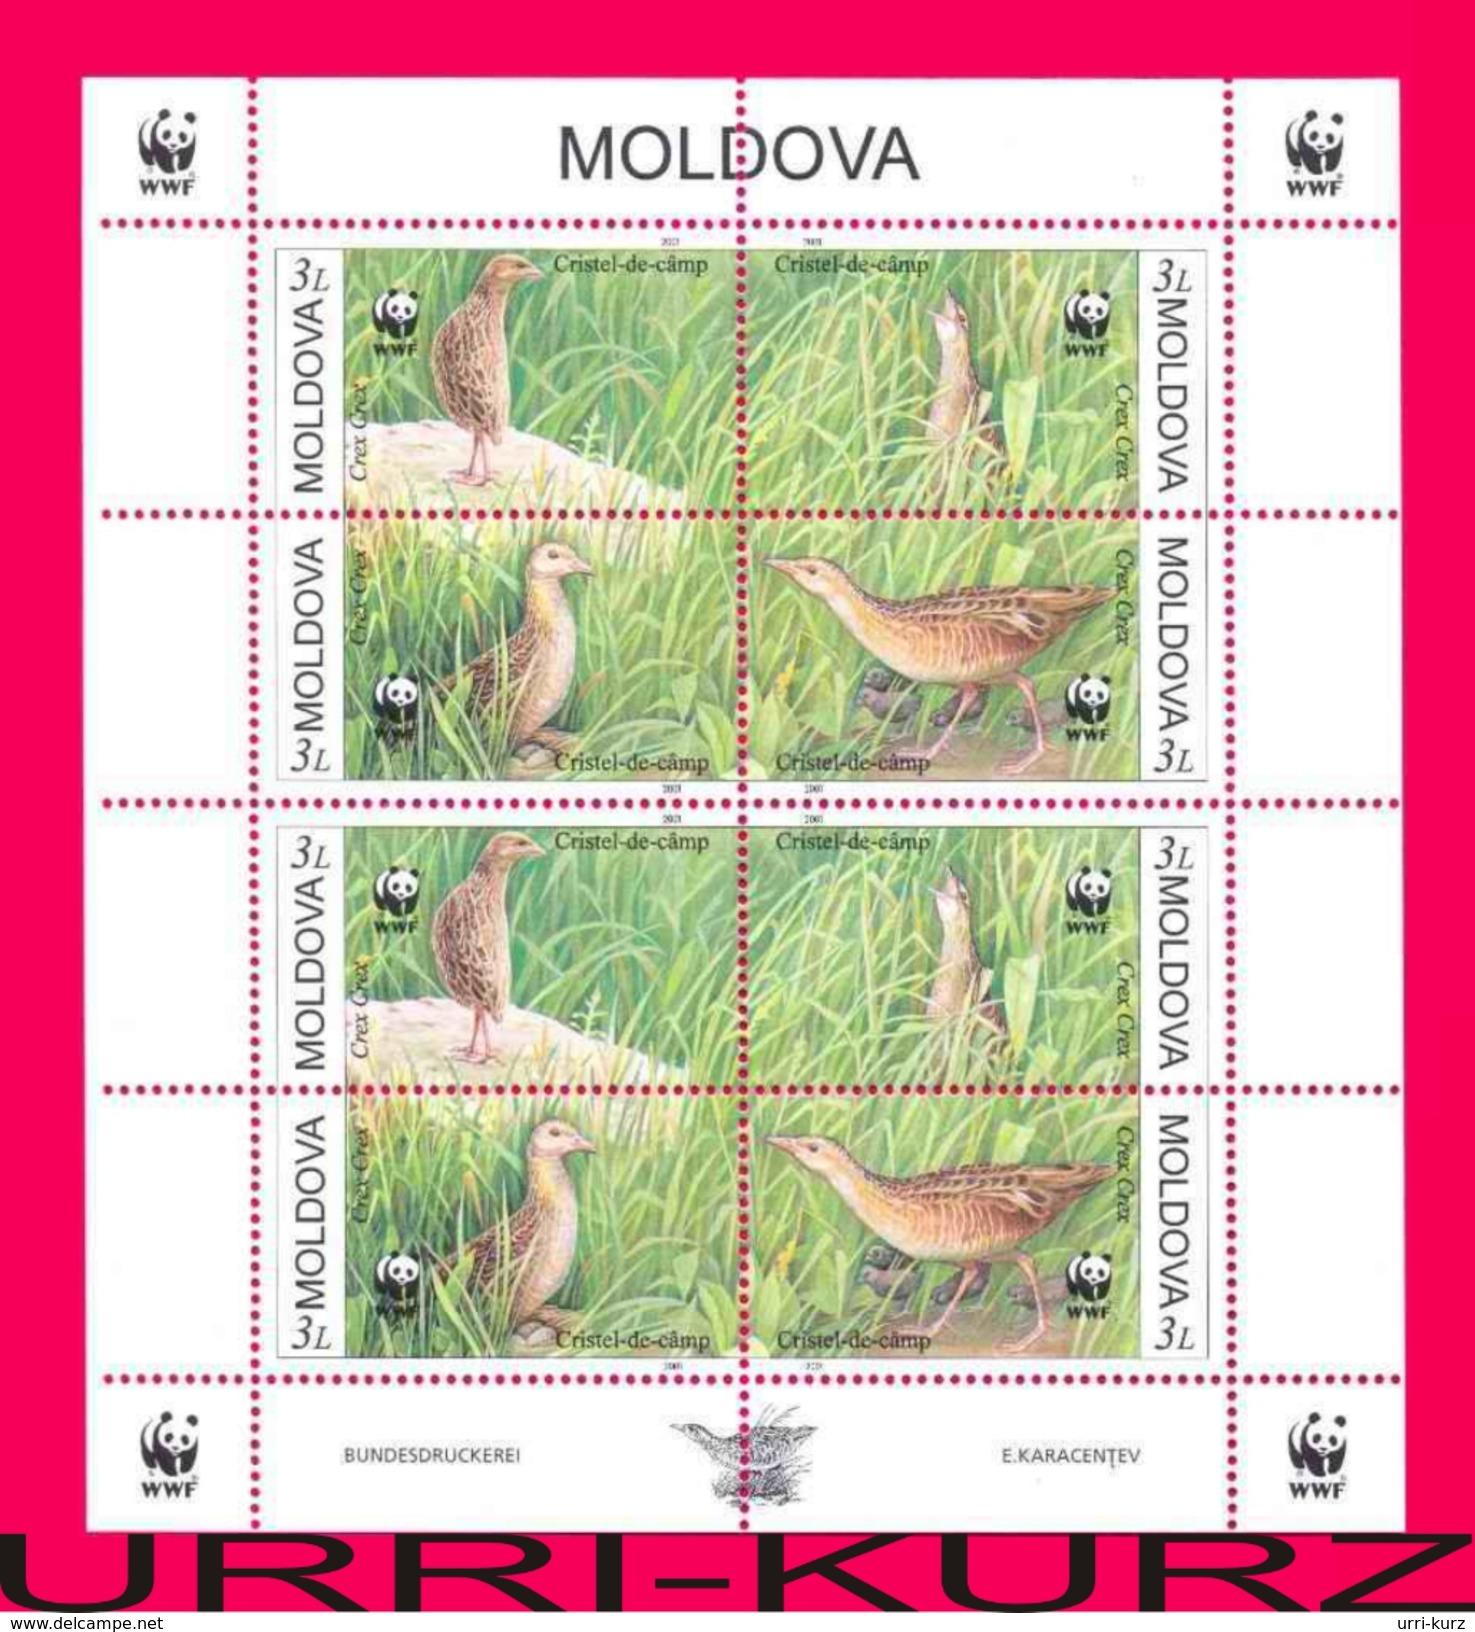 MOLDOVA 2001 Nature Fauna Birds Corncrake (Crex Crex) WWF Sheetlet Mi Klb.379-382 Sc370 MNH - W.W.F.